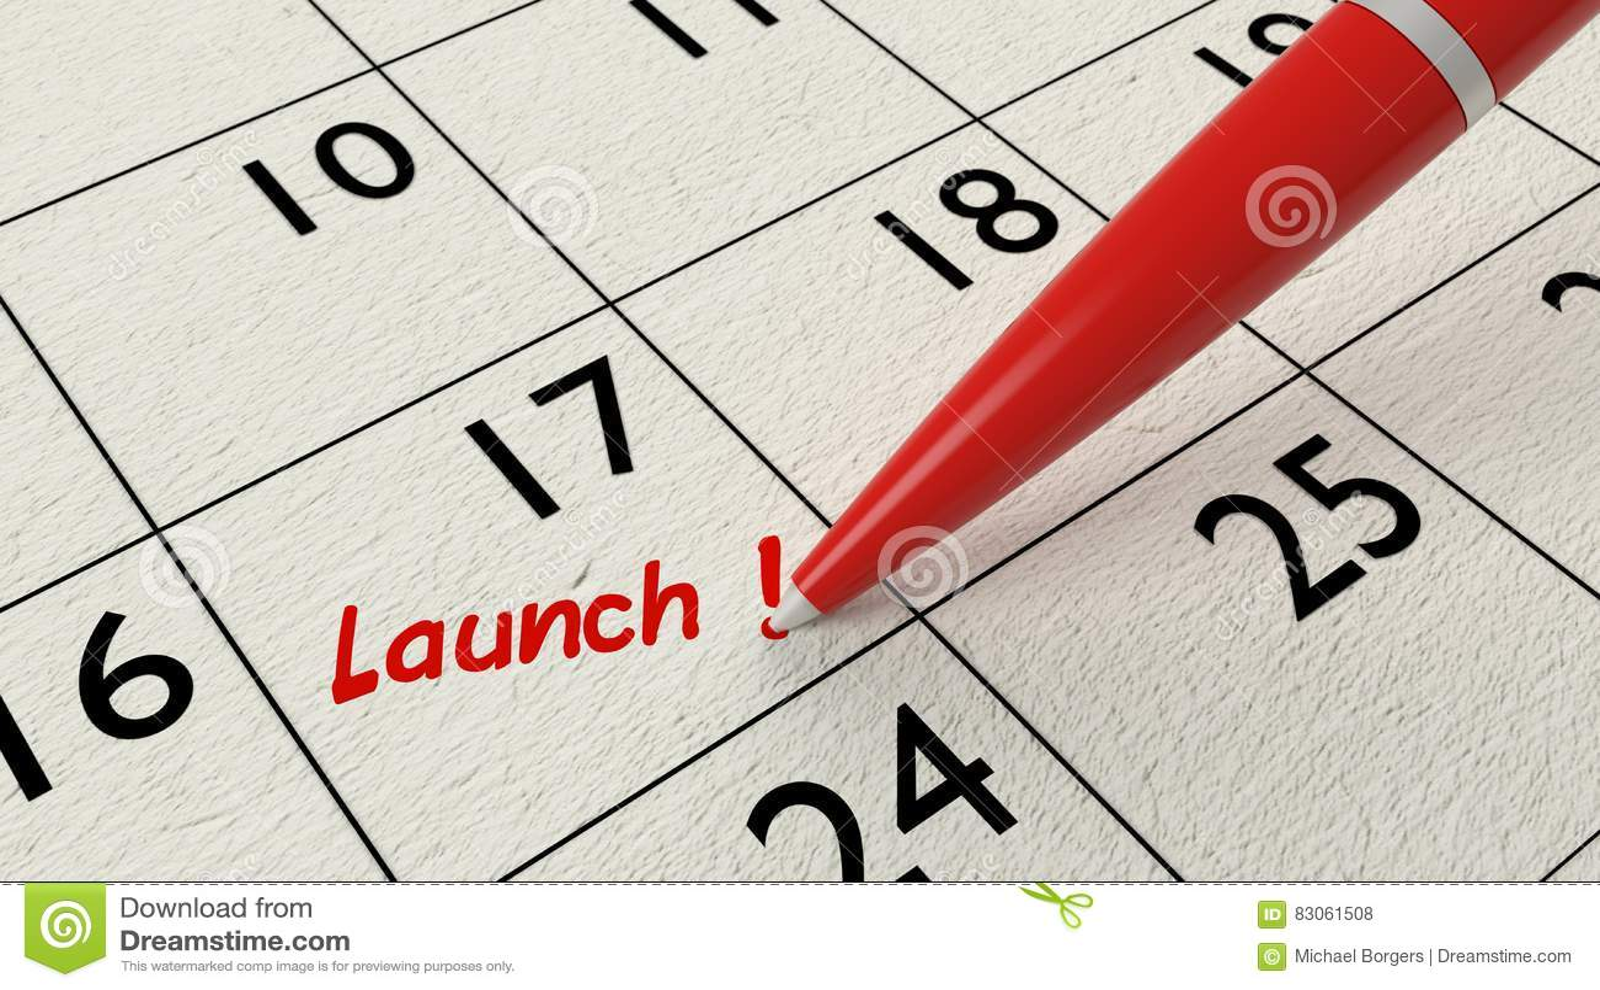 79a140da849 Launch Calendar Entry Red Pen Stock Illustration - Illustration of ...